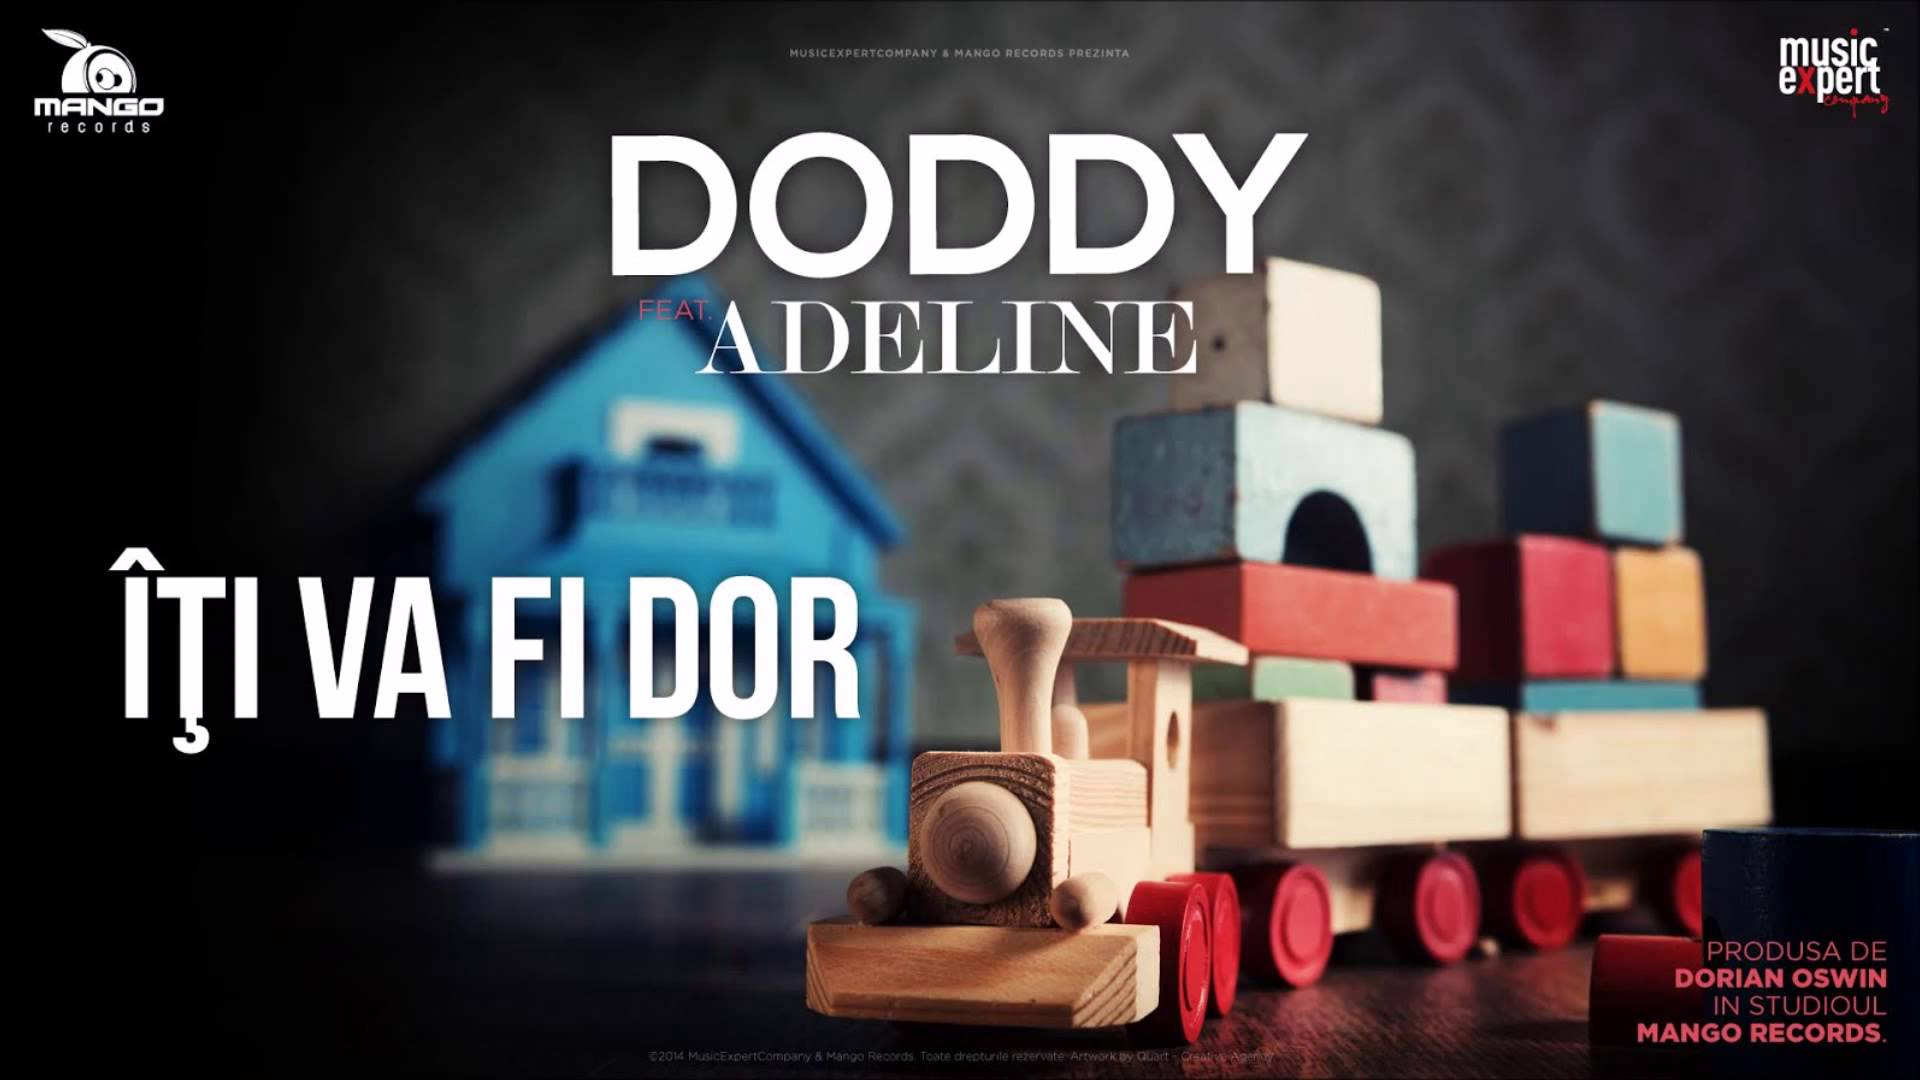 "Doddy si Adeline lanseaza ""videoclipul amintirilor"": ""Iti va fi dor"""